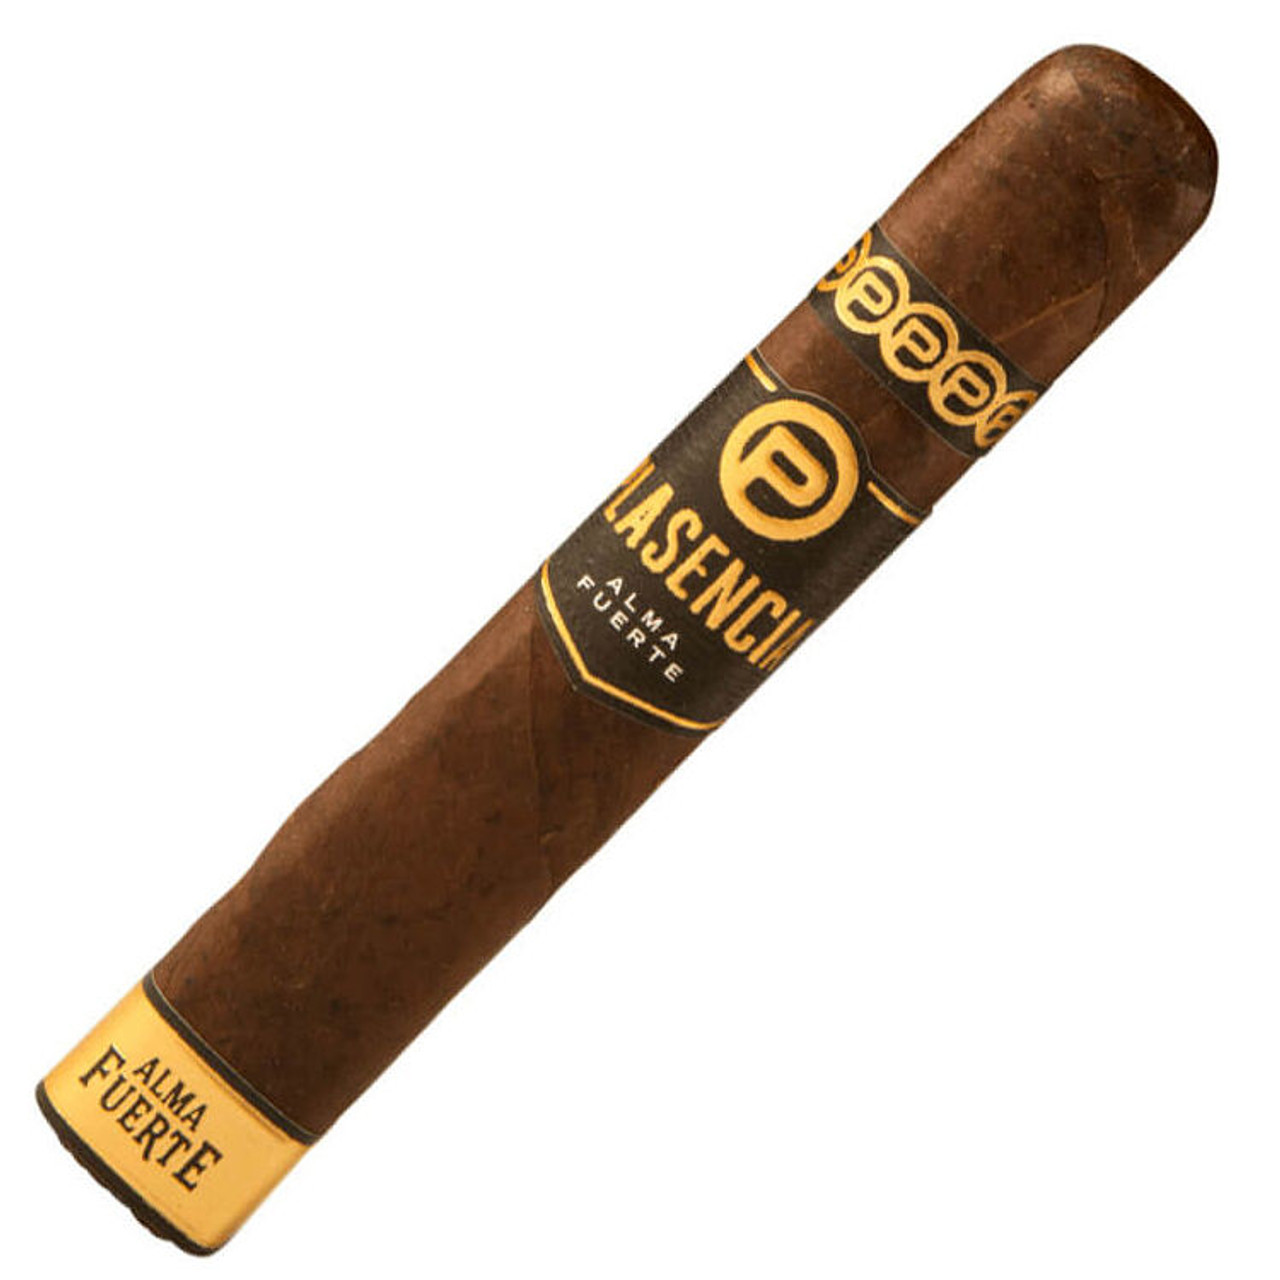 Plasencia Alma Fuerte Robusto Cigars - 5.25 x 52 (Box of 10)